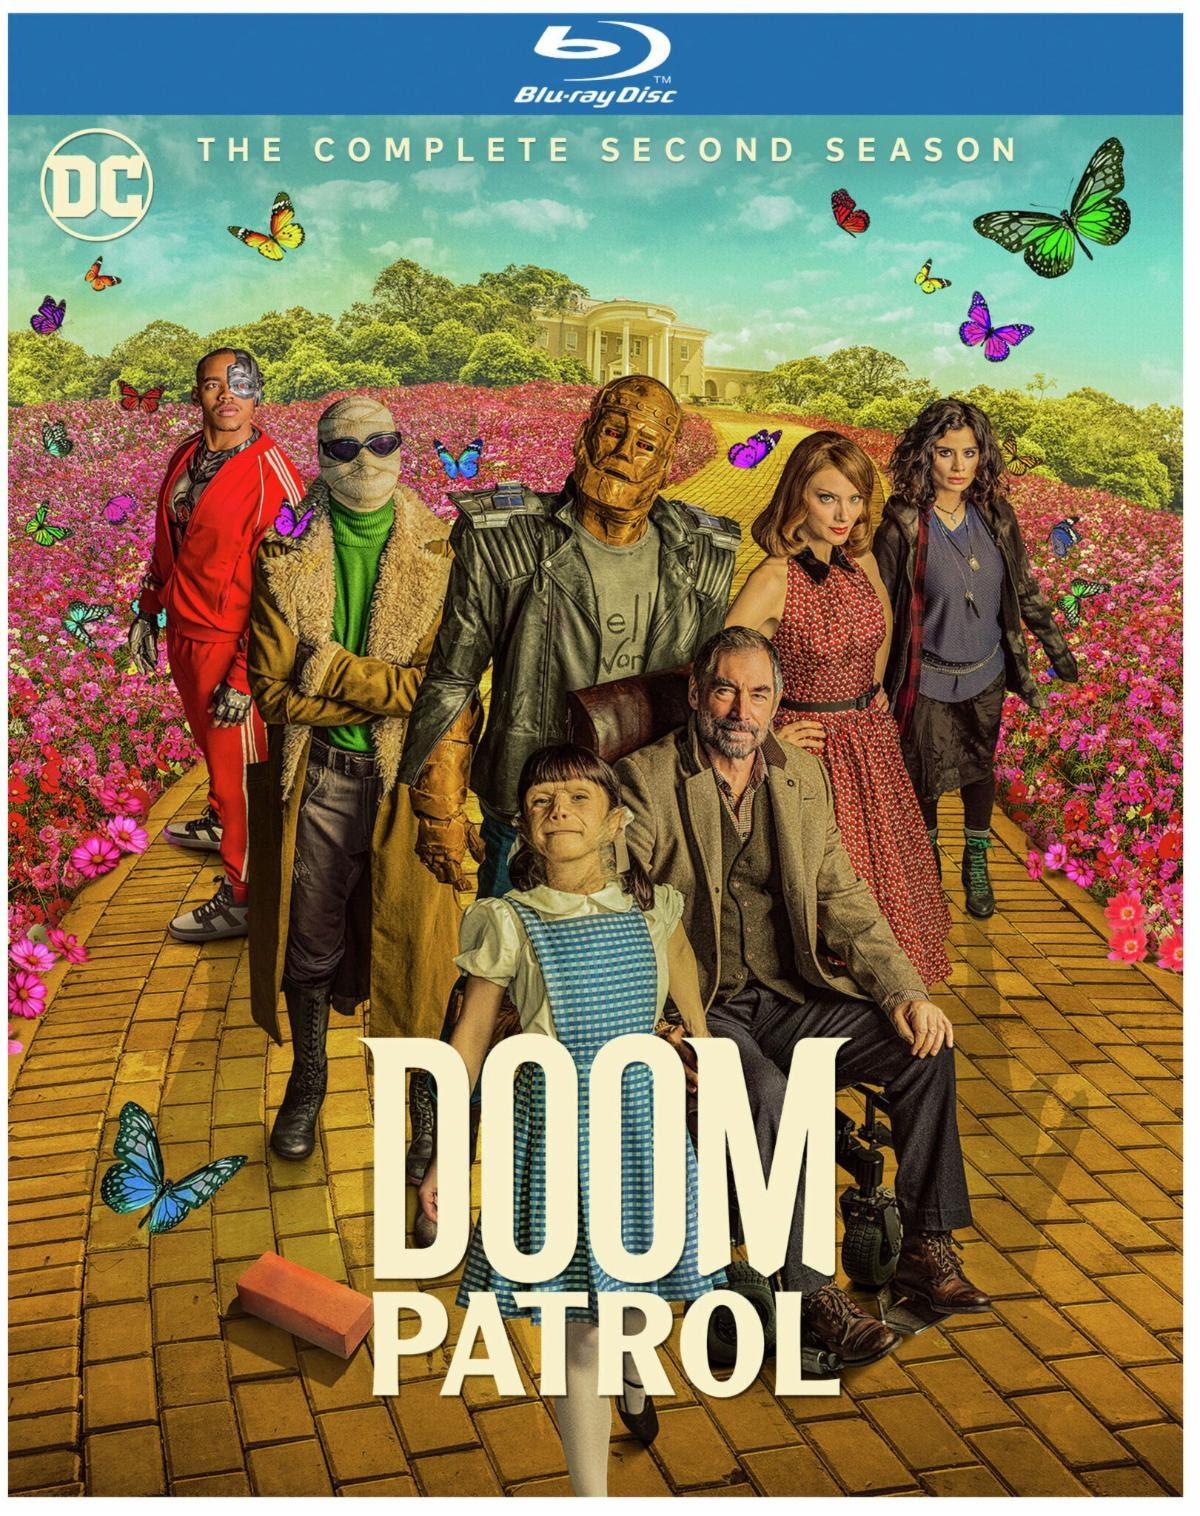 Doom Patrol Season Two On Blu Ray Dvd January 26 2021